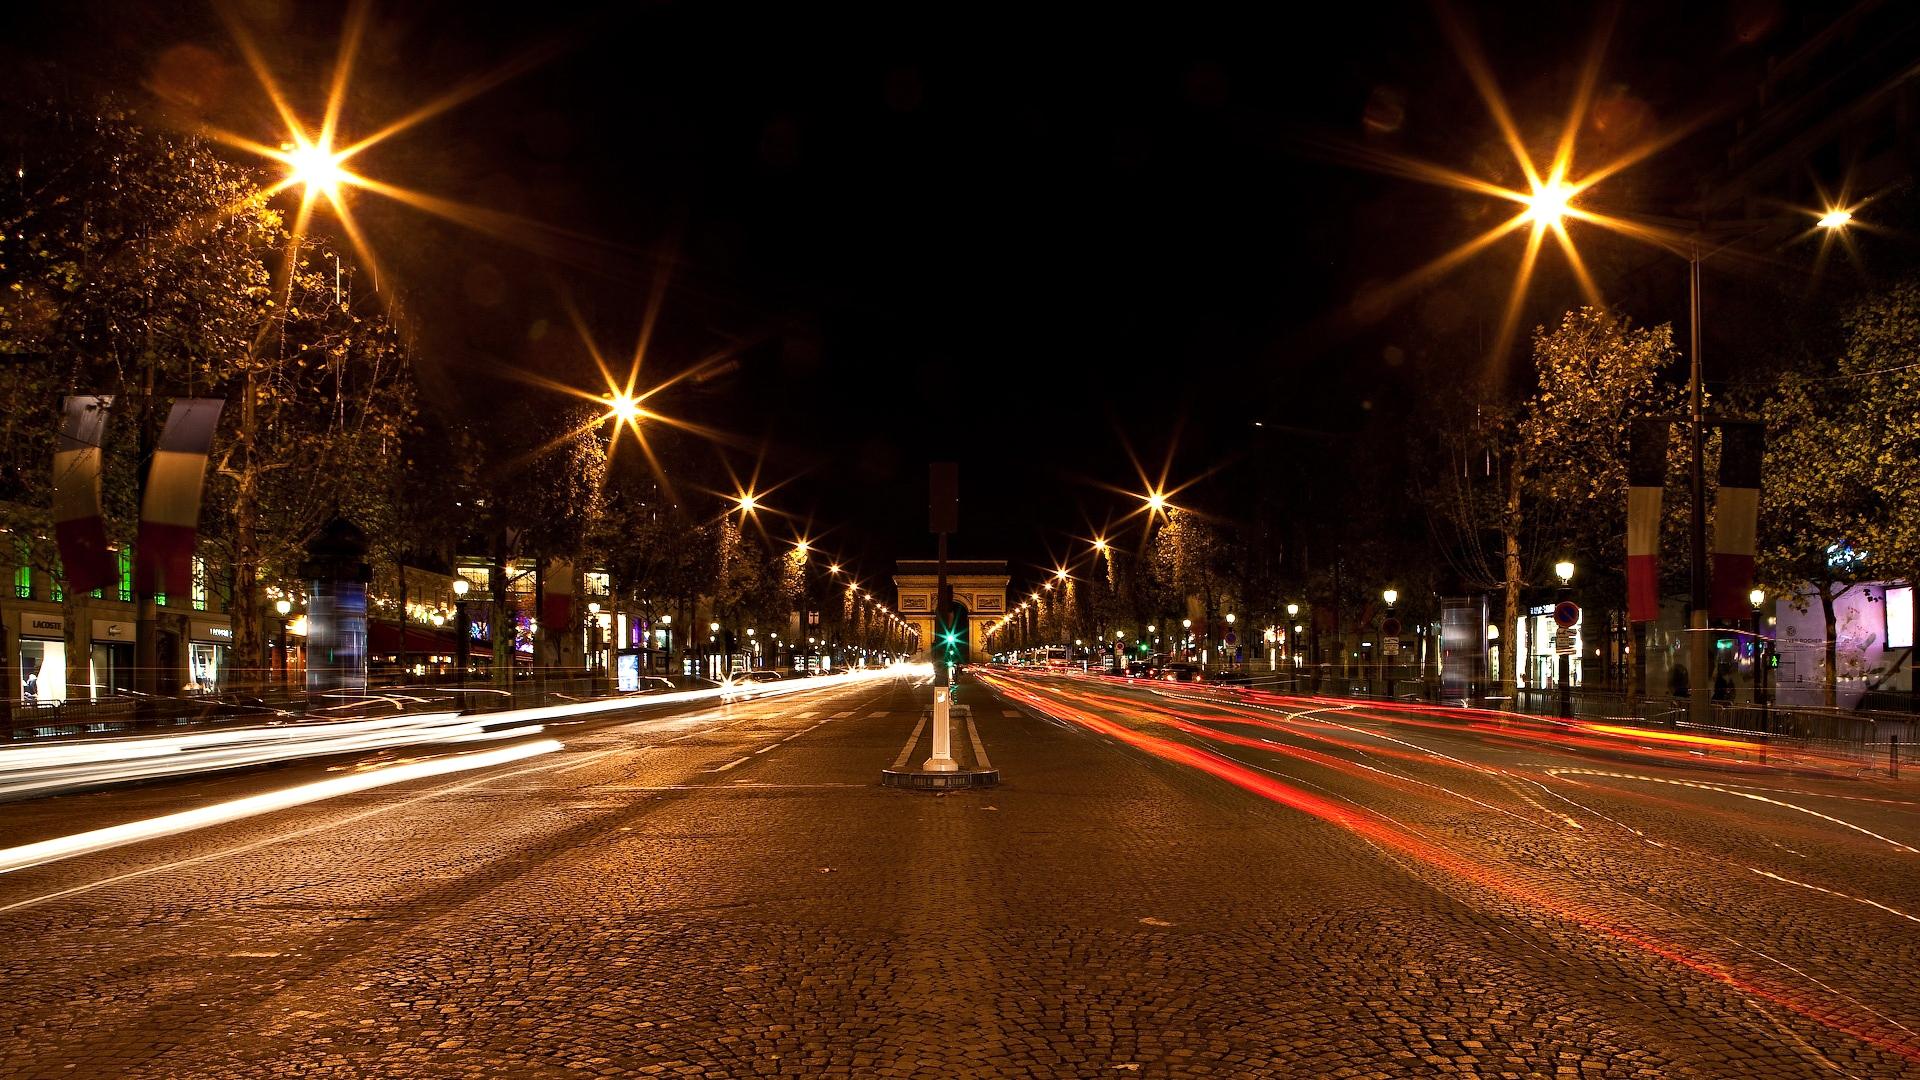 Wallpaper Street Light Cityscape Night Sky Evening Germany Traffic Town Highway City Lights Christmas Metropolis Asphalt Gates